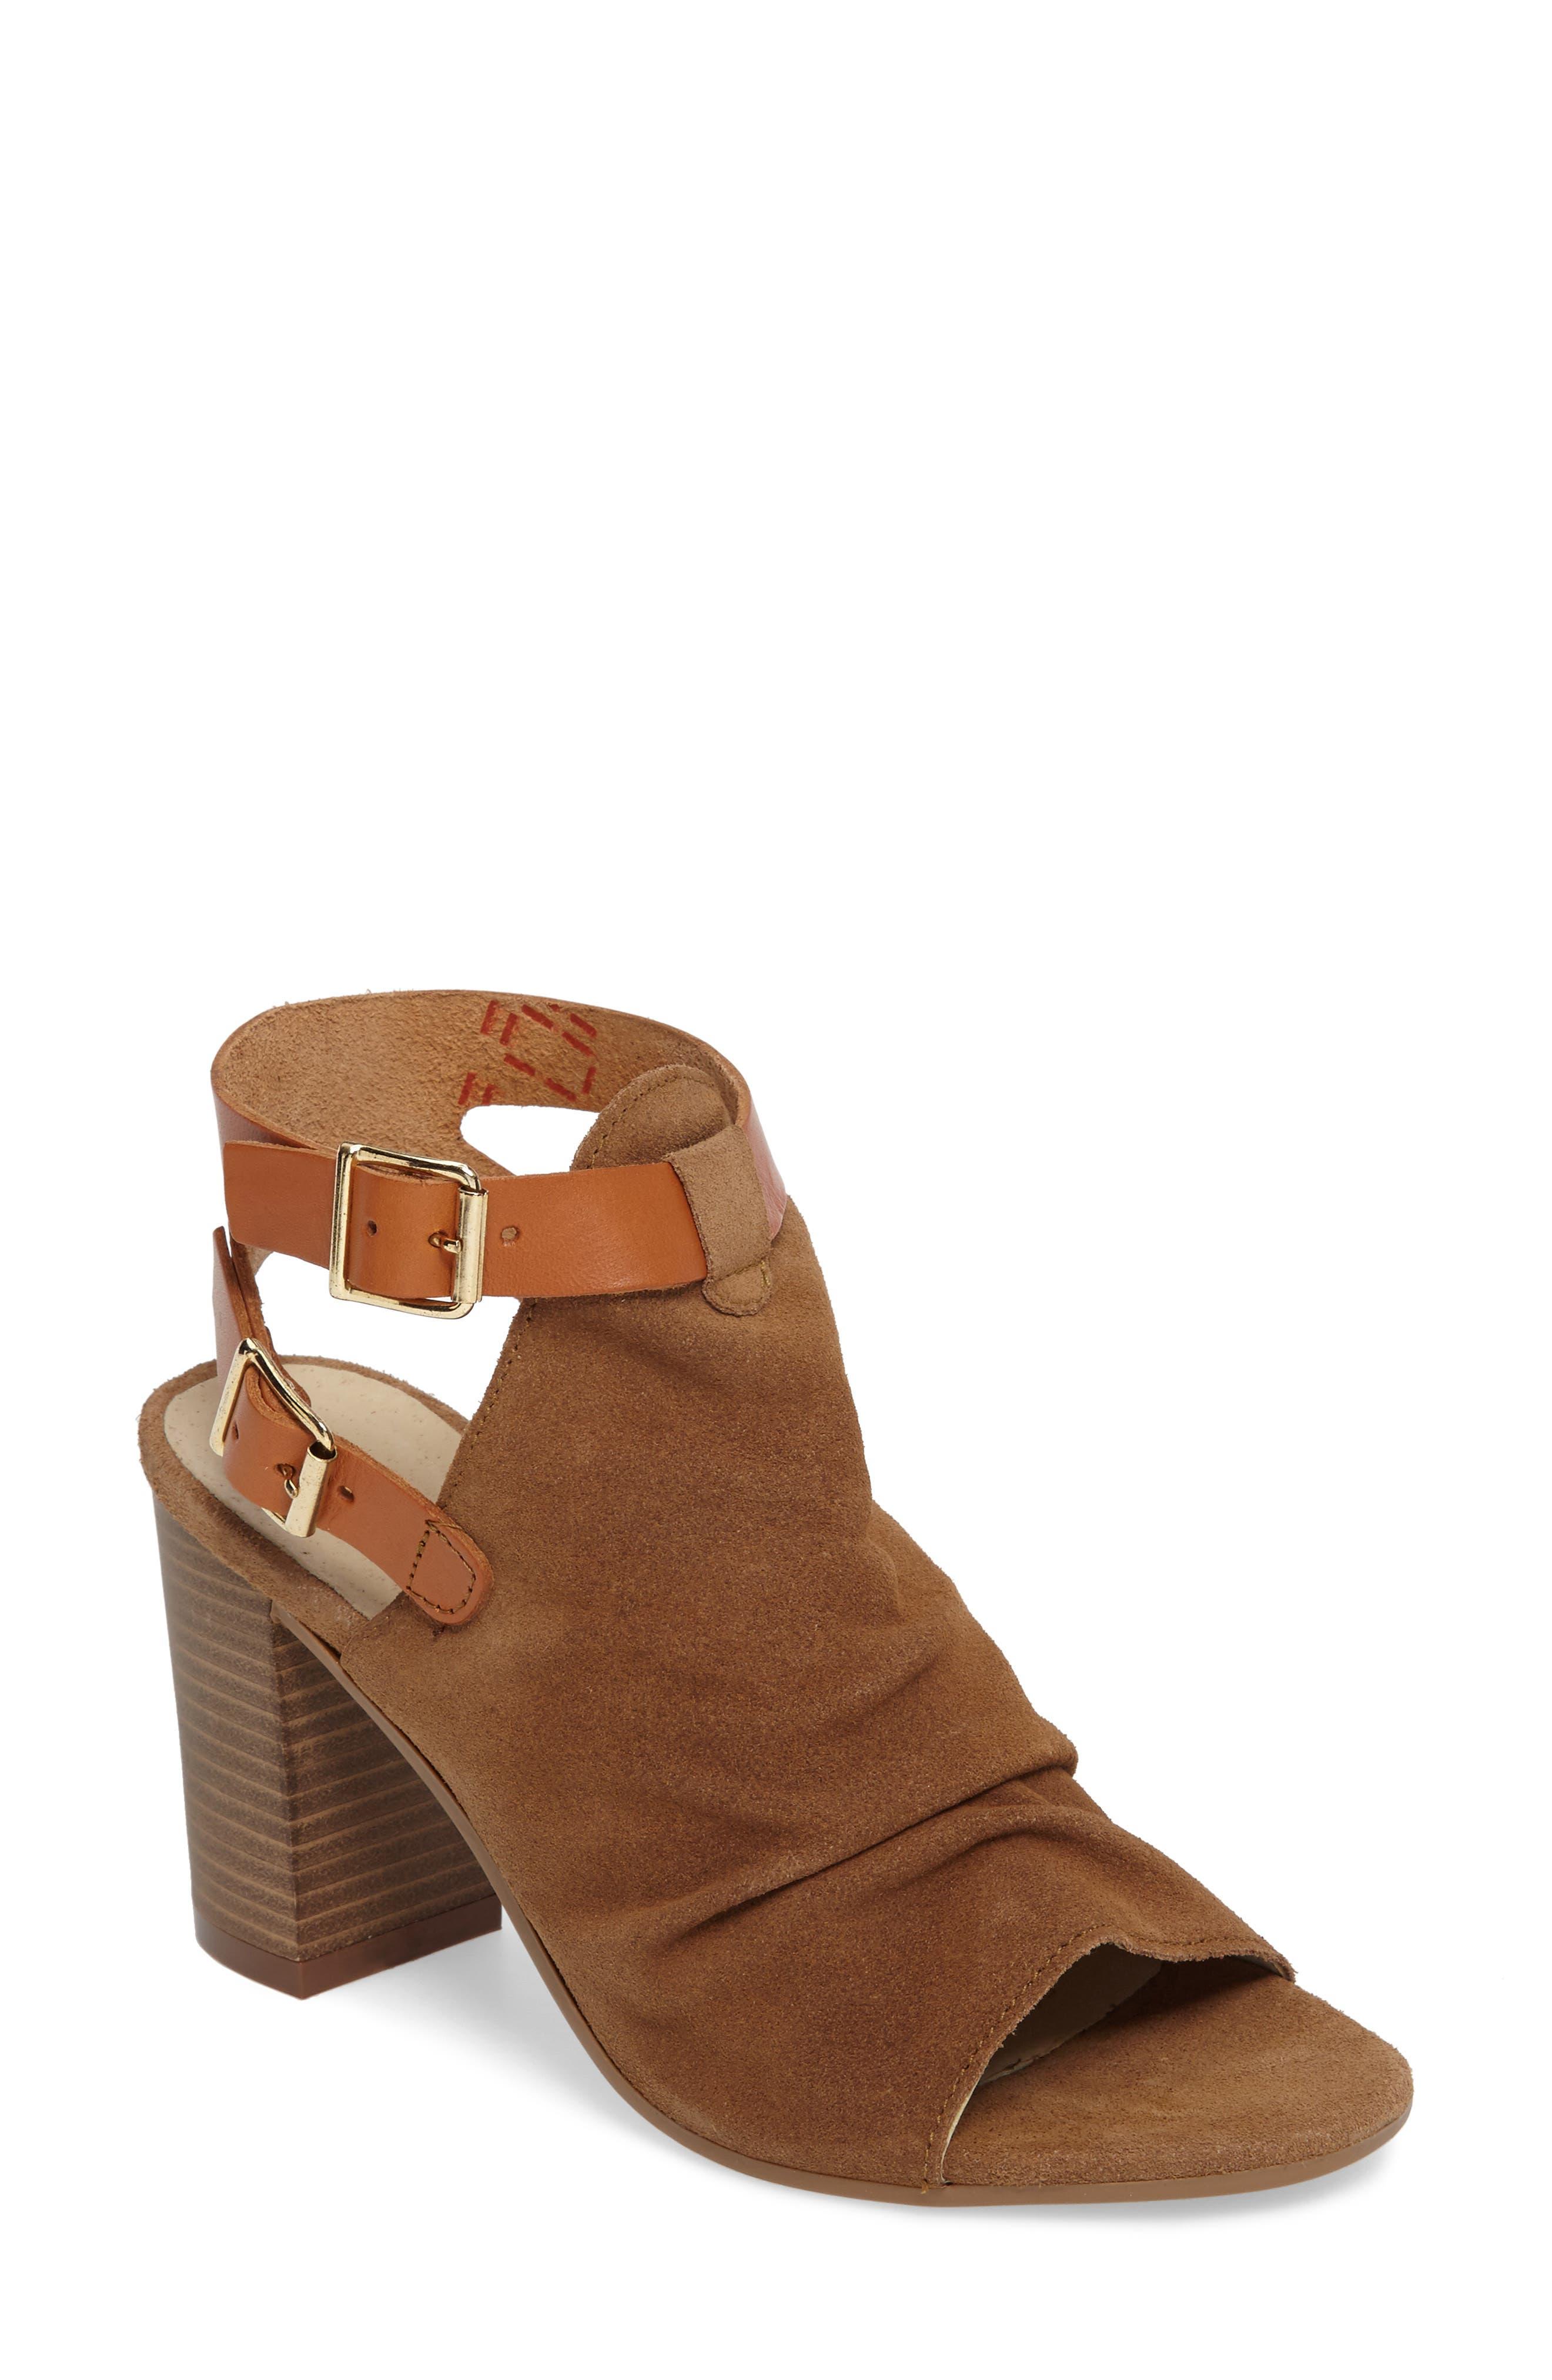 Bos. & Co. Ivy Block Heel Sandal (Women)